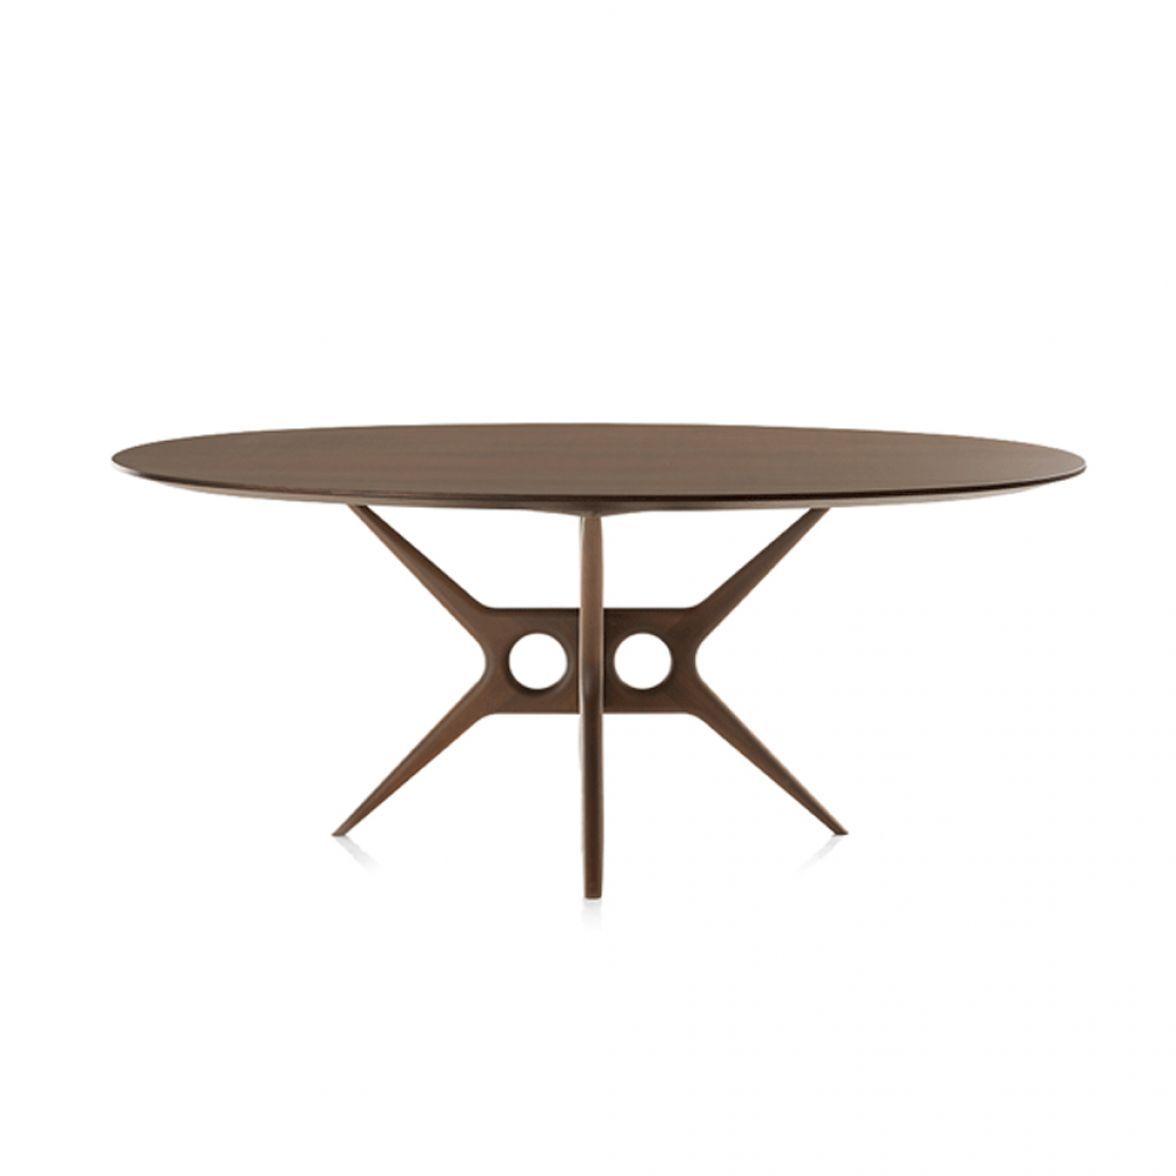 Tazio dining table